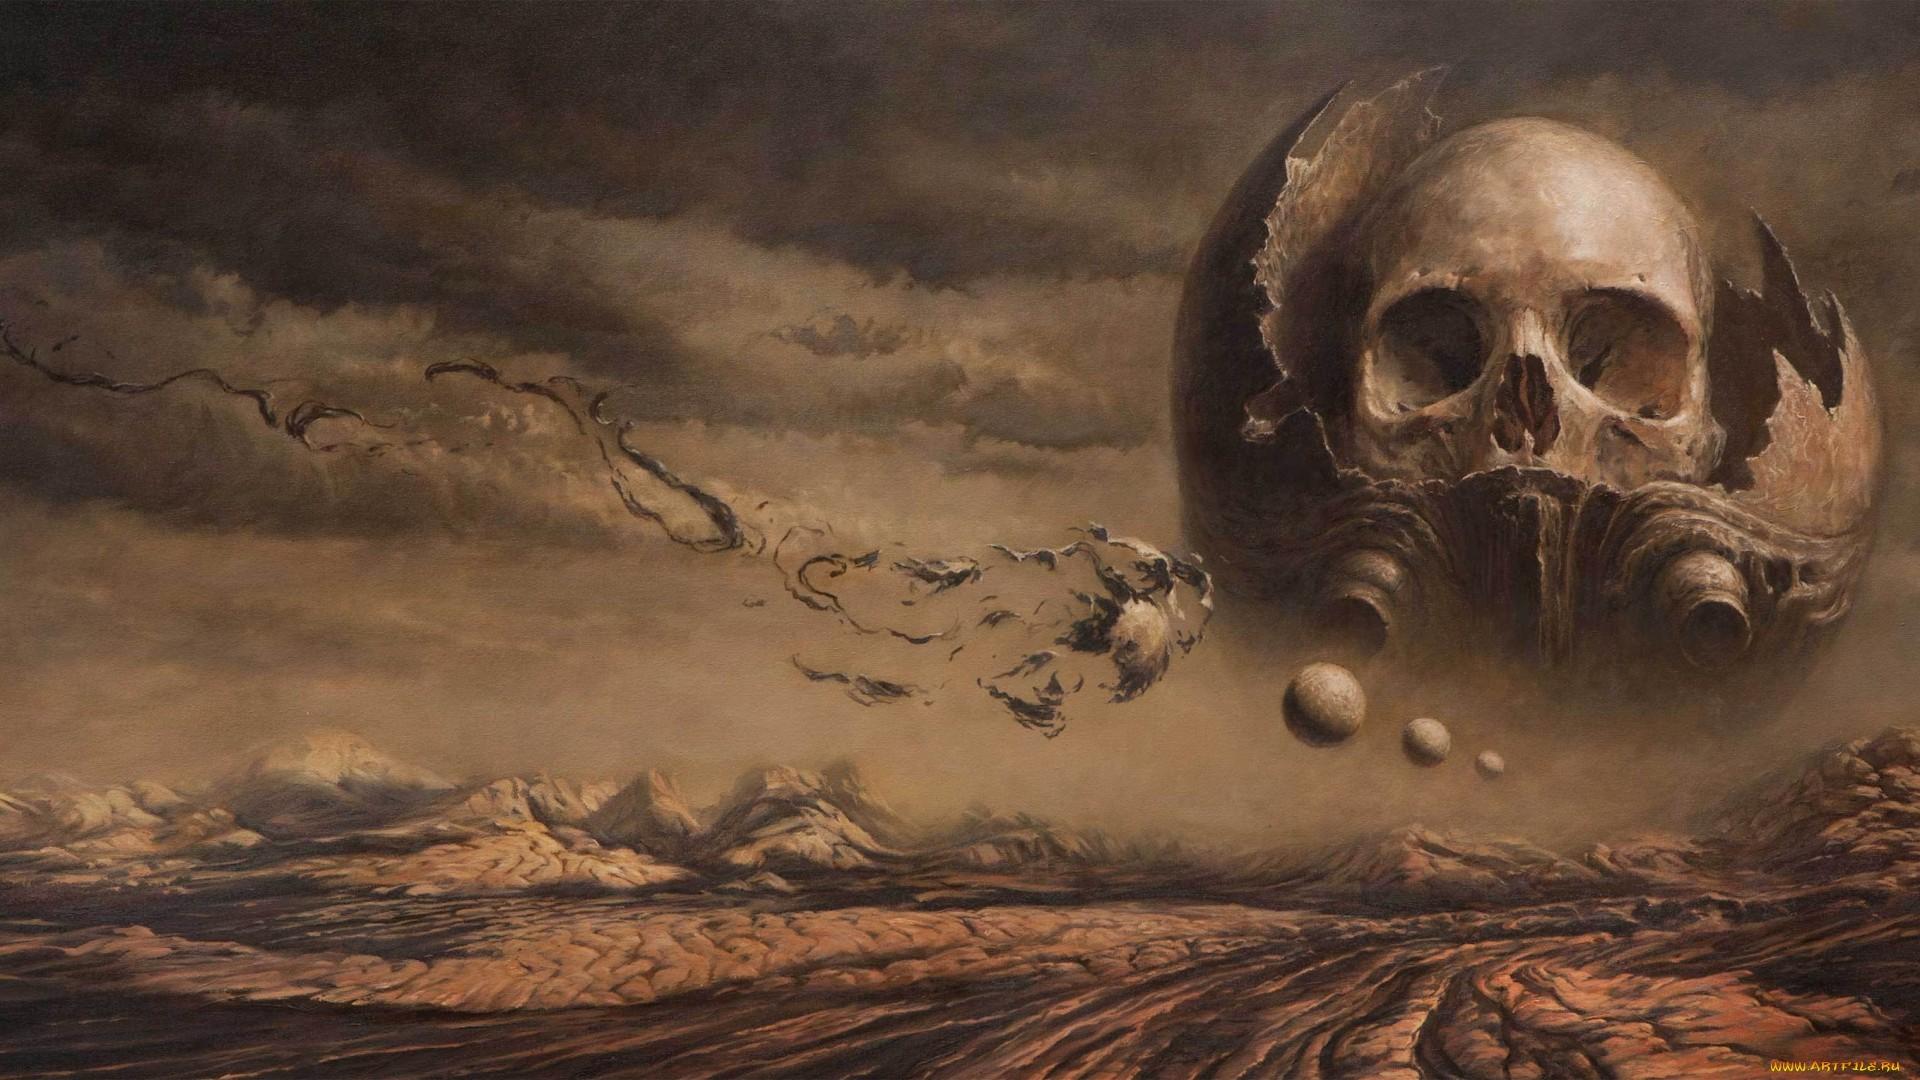 dark sci fi sci science wallpaper 1920x1080 79573 WallpaperUP 1920x1080